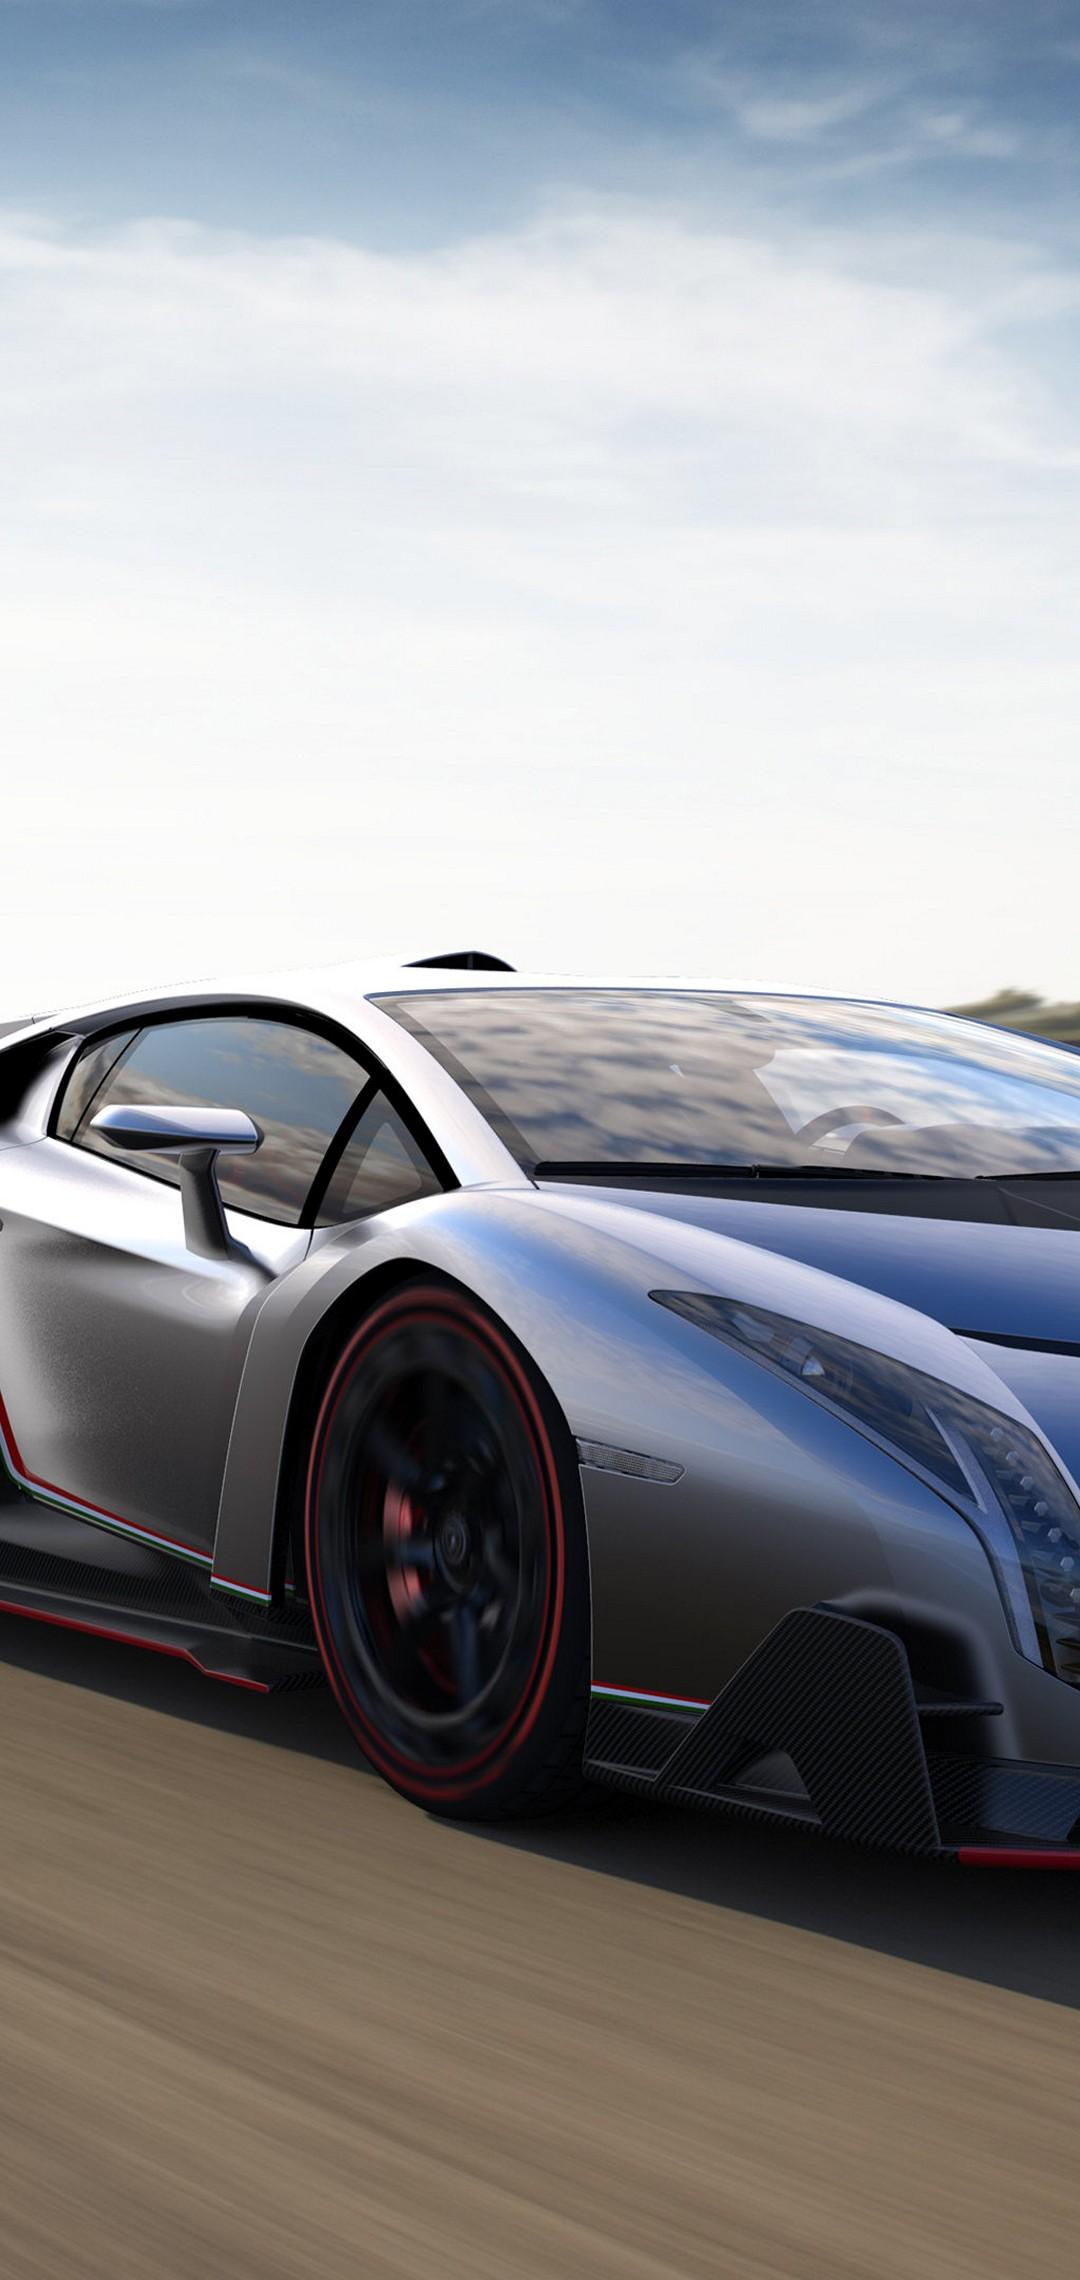 Car Wallpaper Windows 7: Car Race Wallpaper